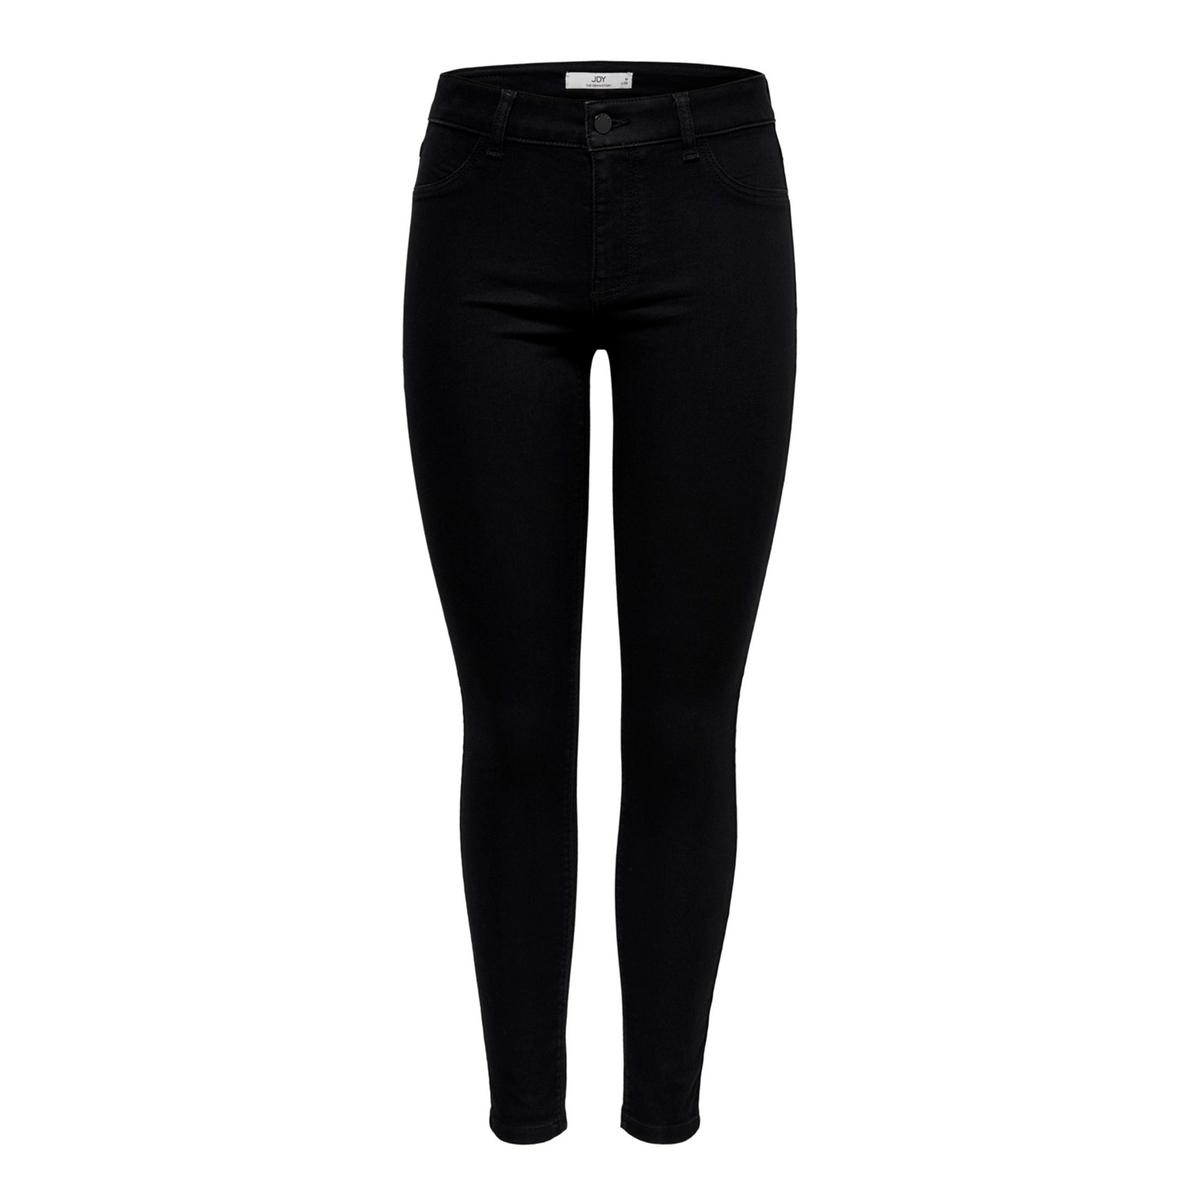 Jeans slim, comprimento 30